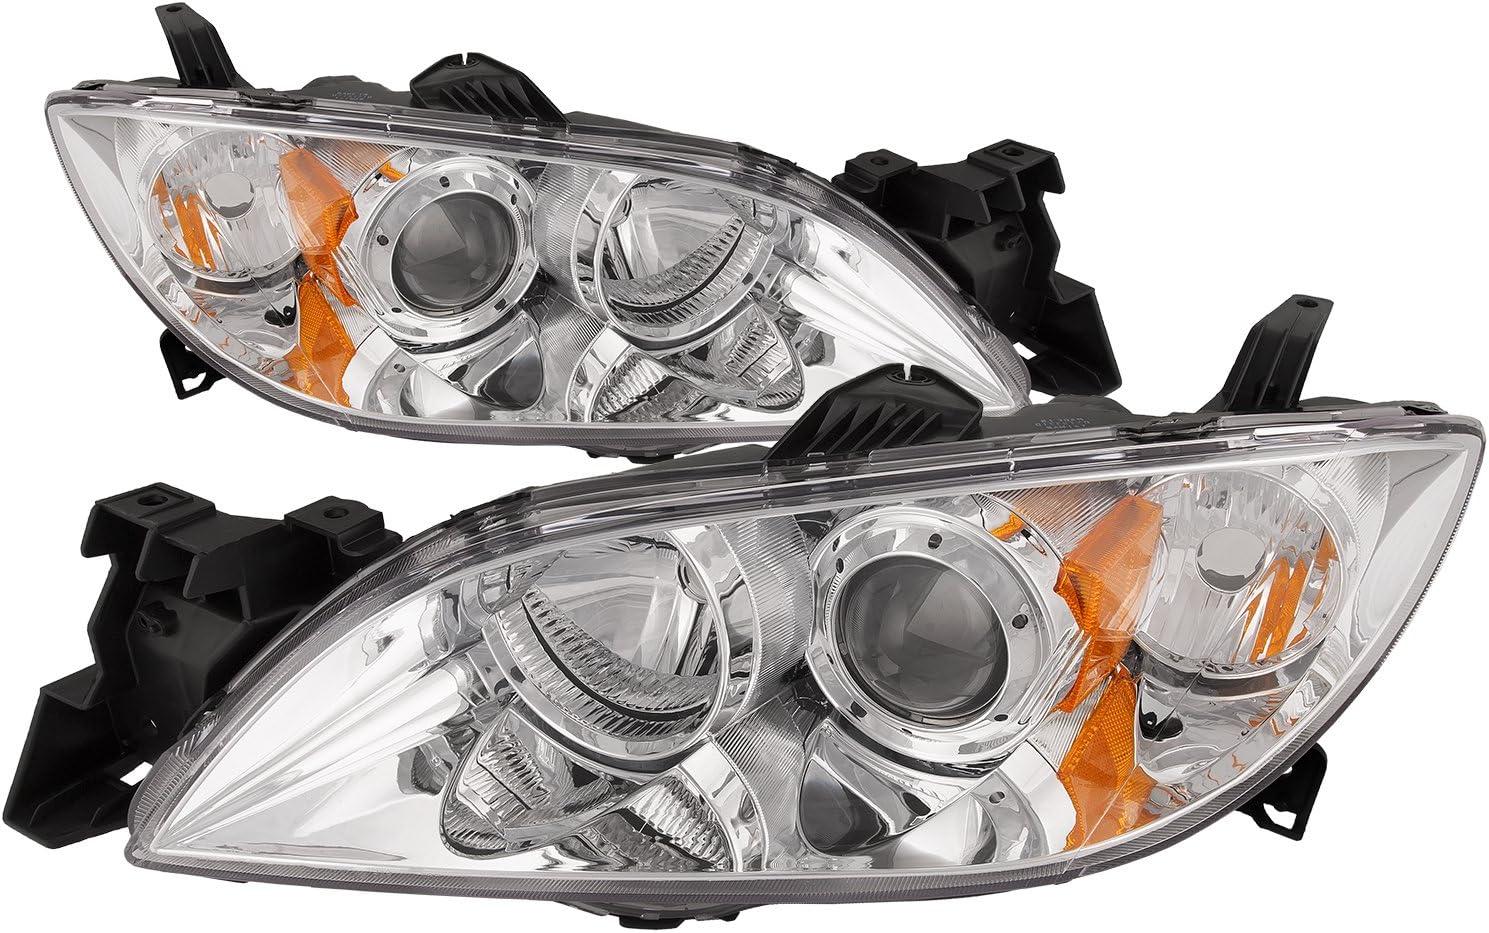 PERDE Chrome Headlights Set Compatible with Mazda 3 Sedan New Halogen Projector Pair